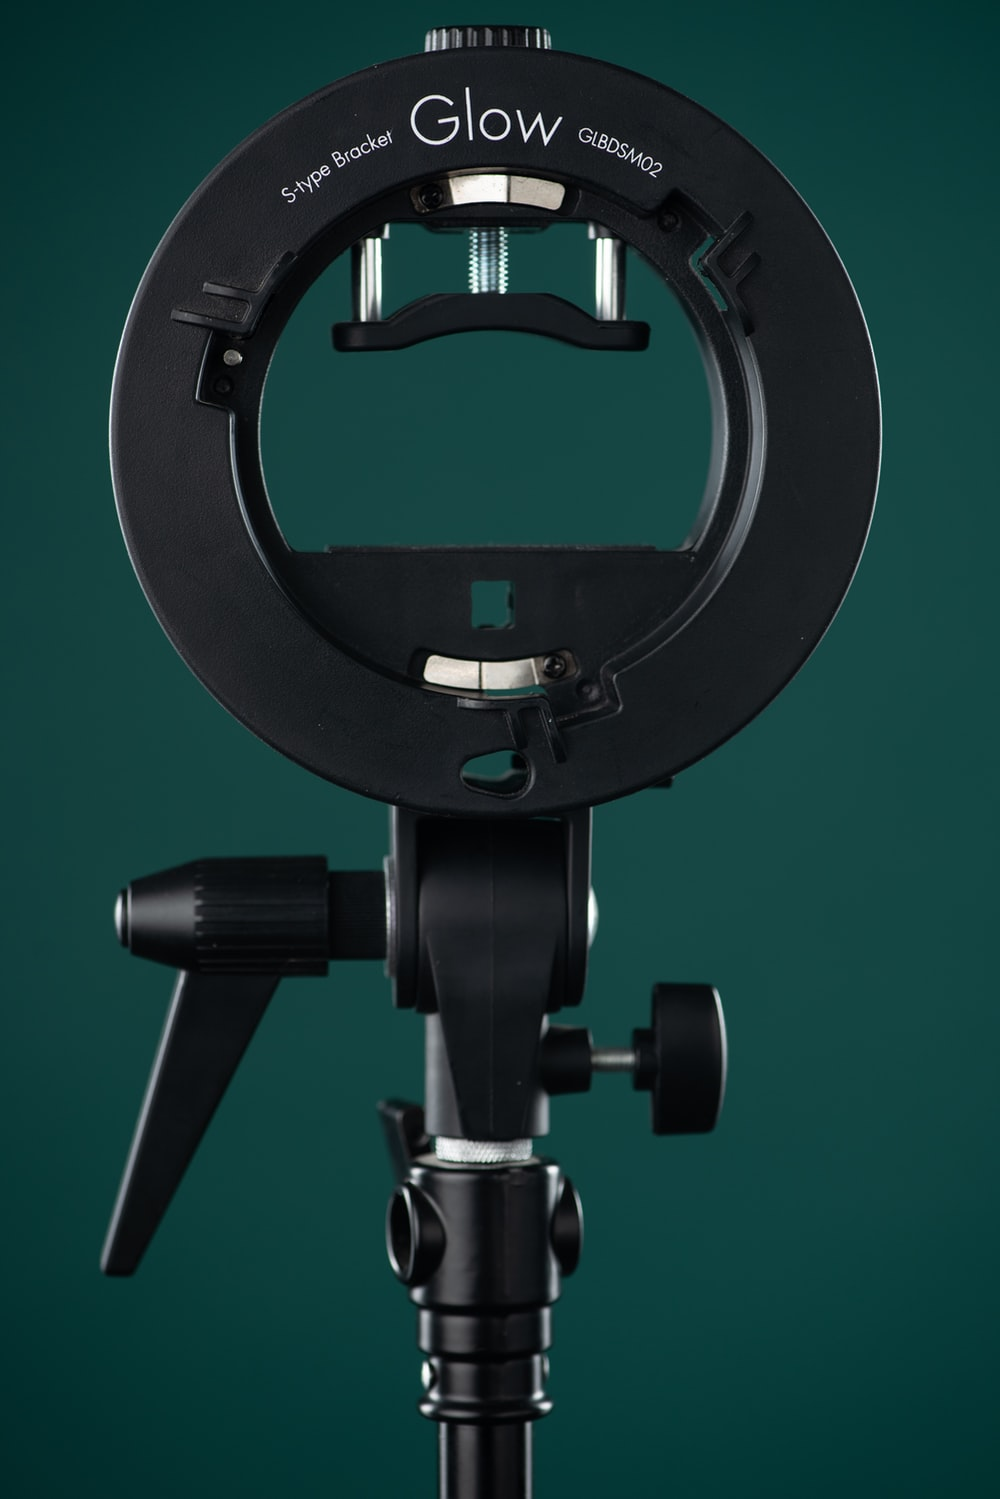 black Glow tripod stand